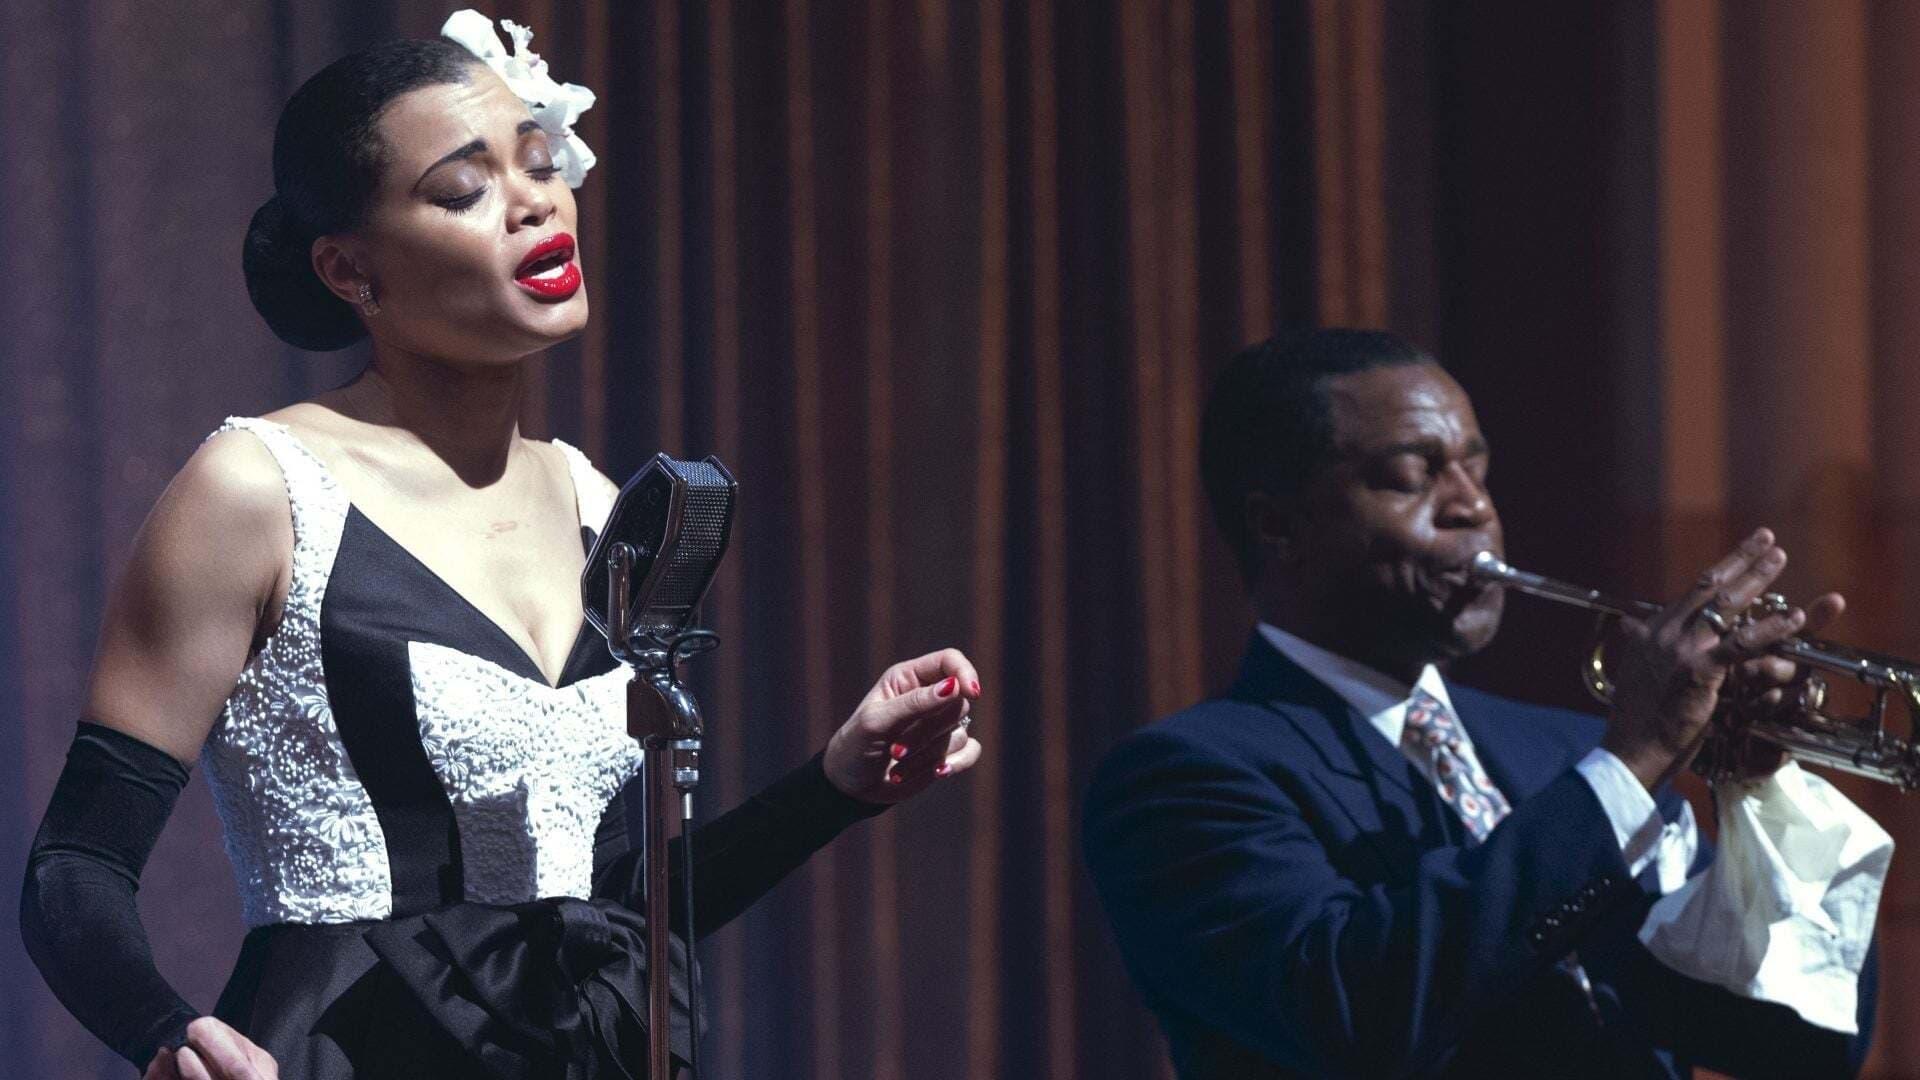 Billie Holiday backdrop